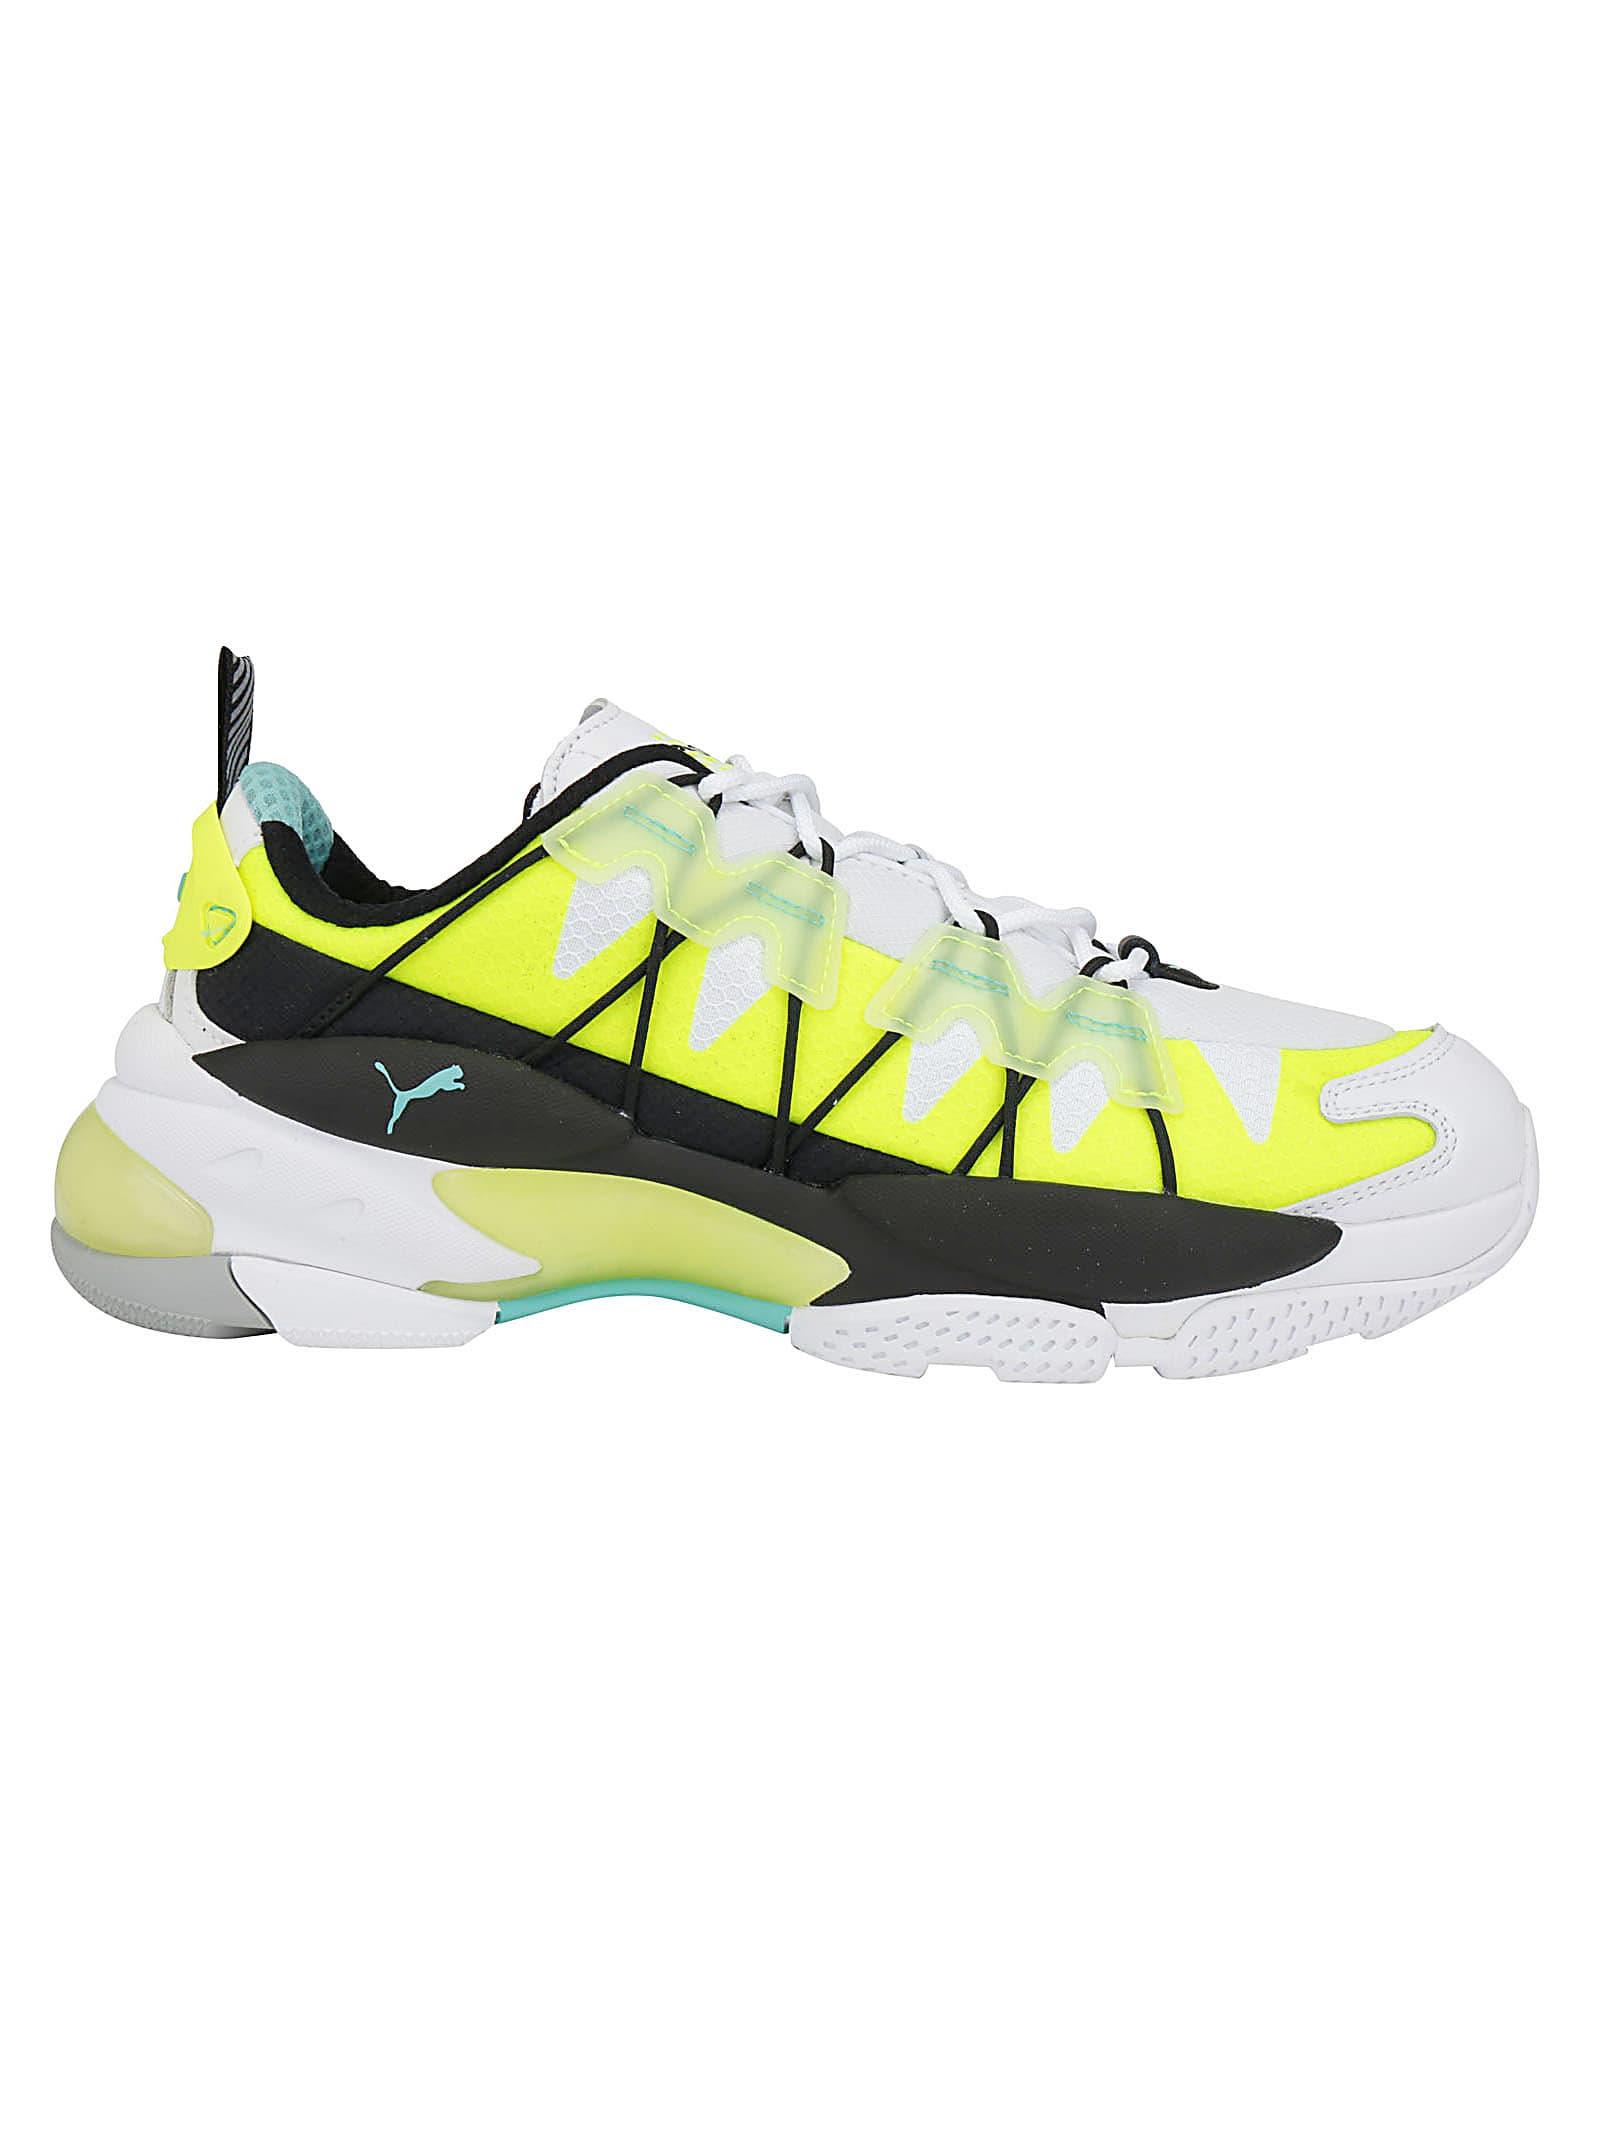 Puma Lqd Cell Omega Lab Sneakers